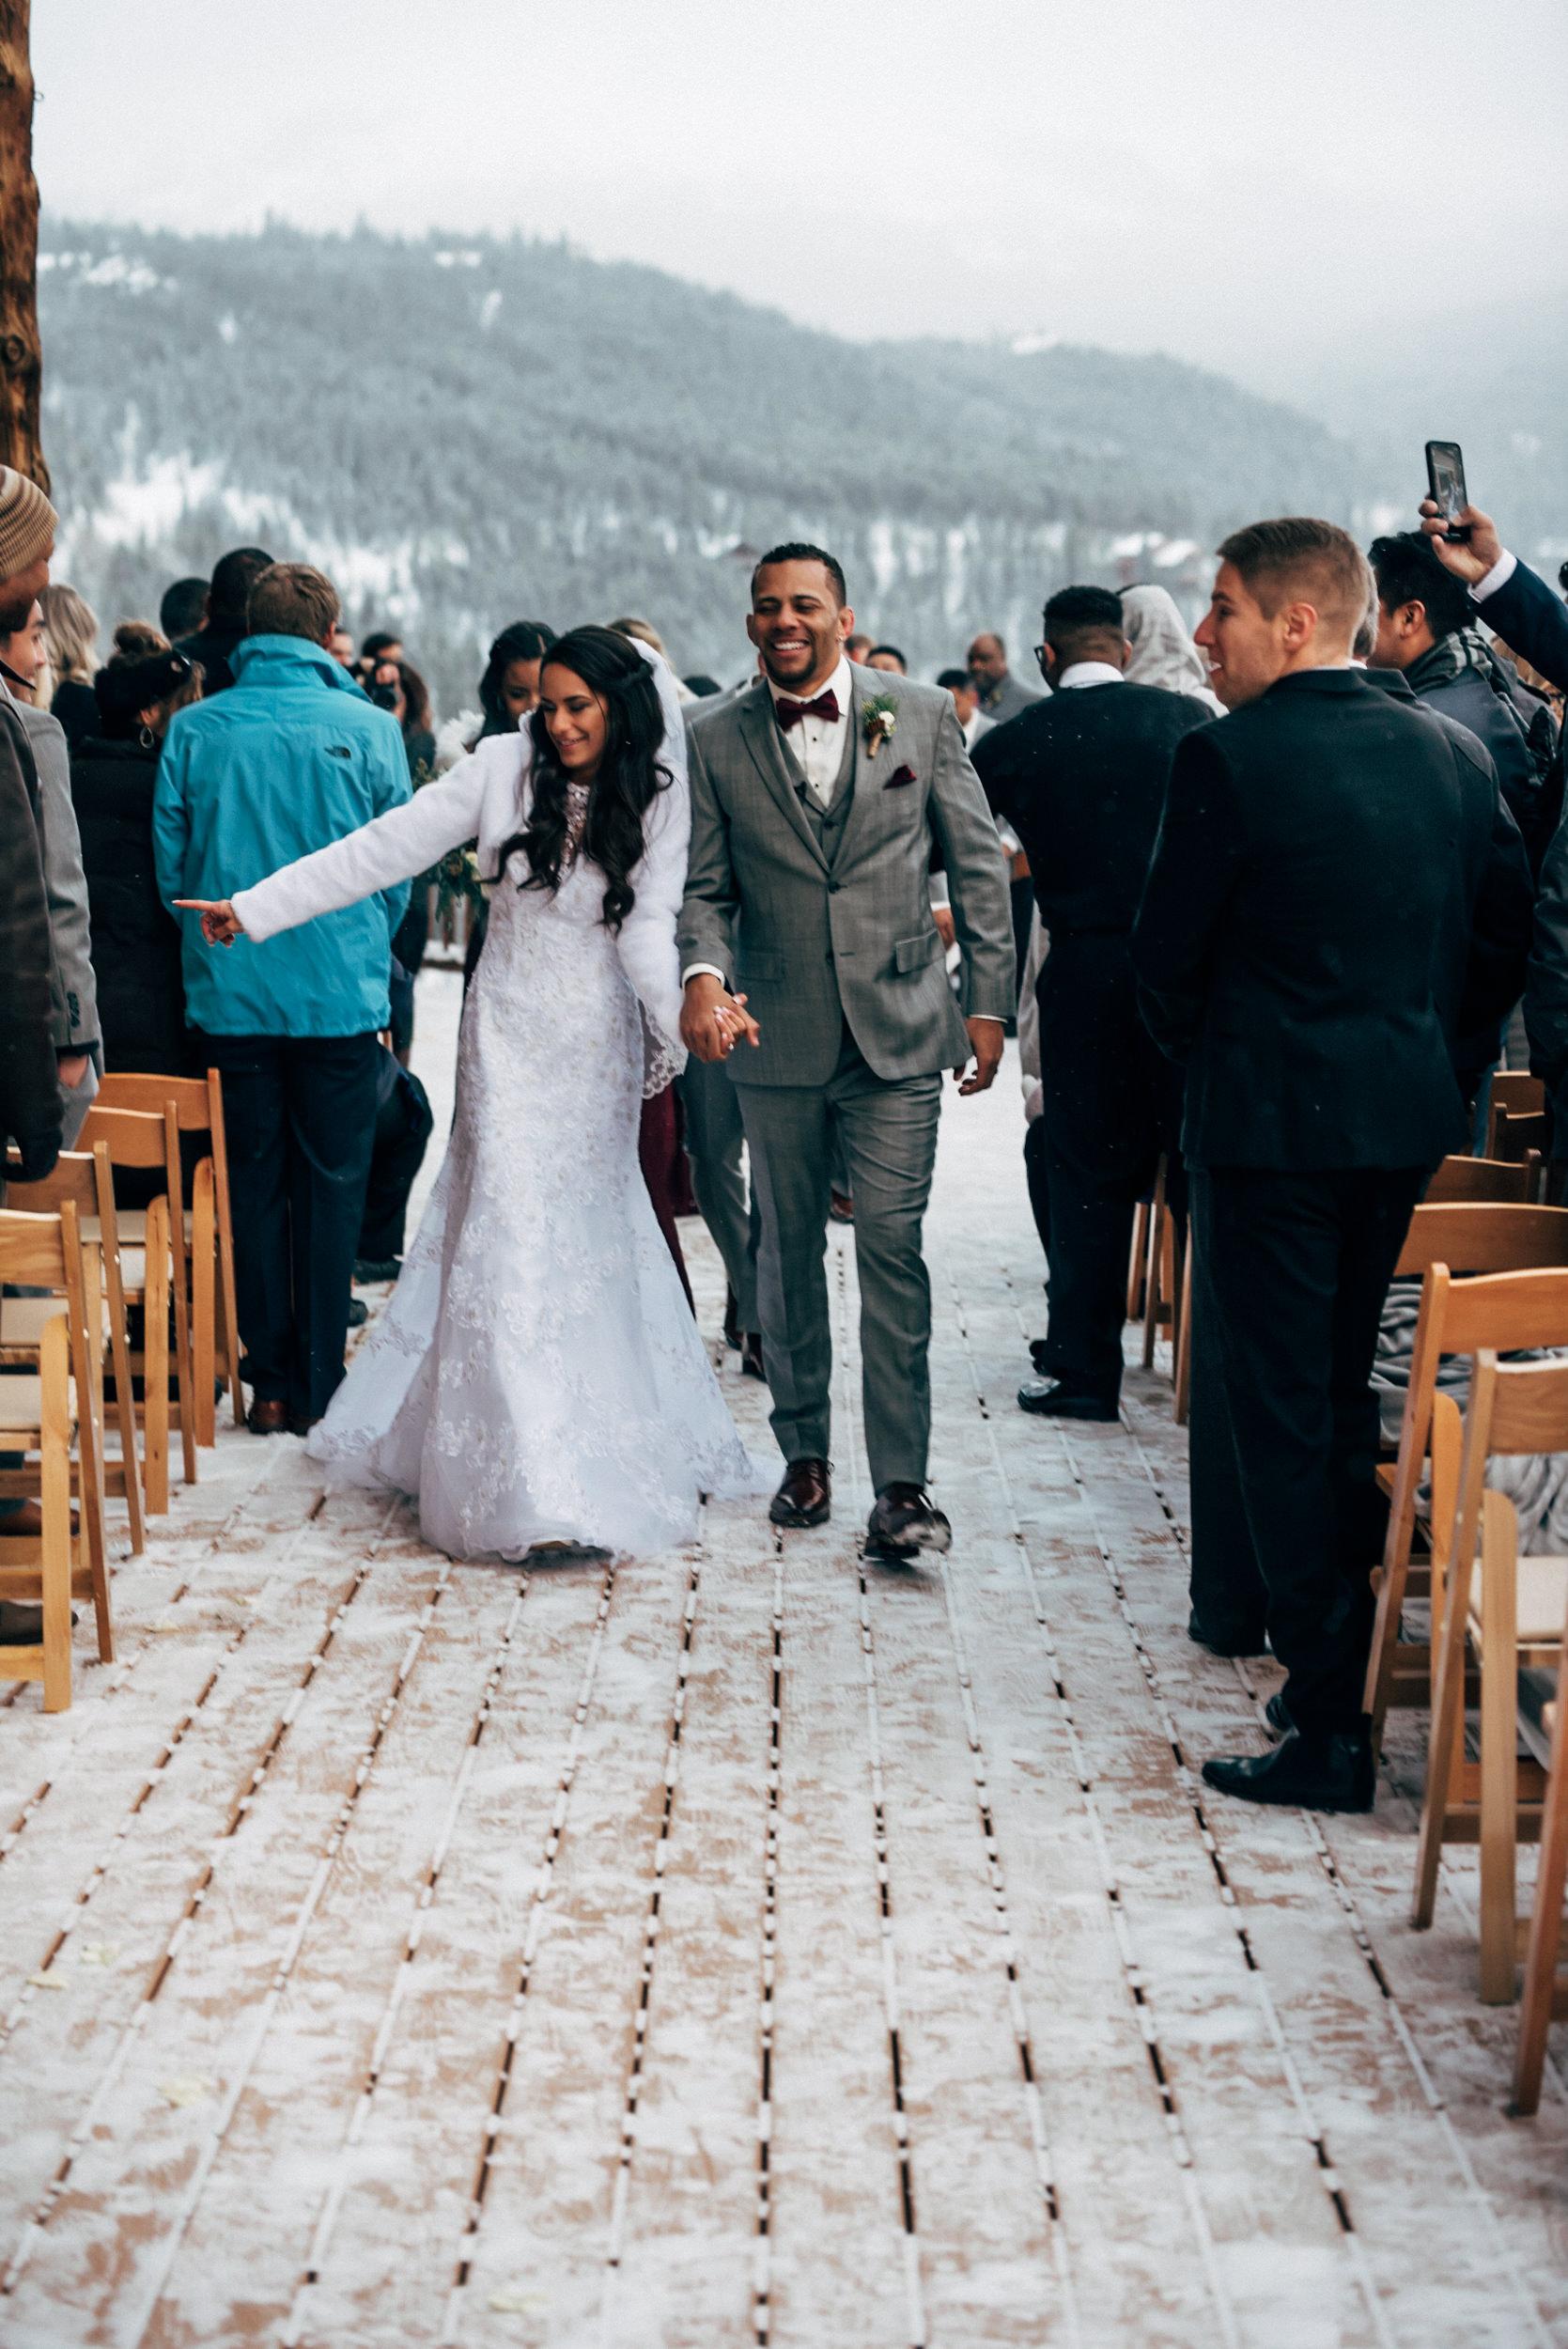 Colorado-Wedding-Photographer-Breckinridge-Mountain-Adventure-Elopement-61.jpg